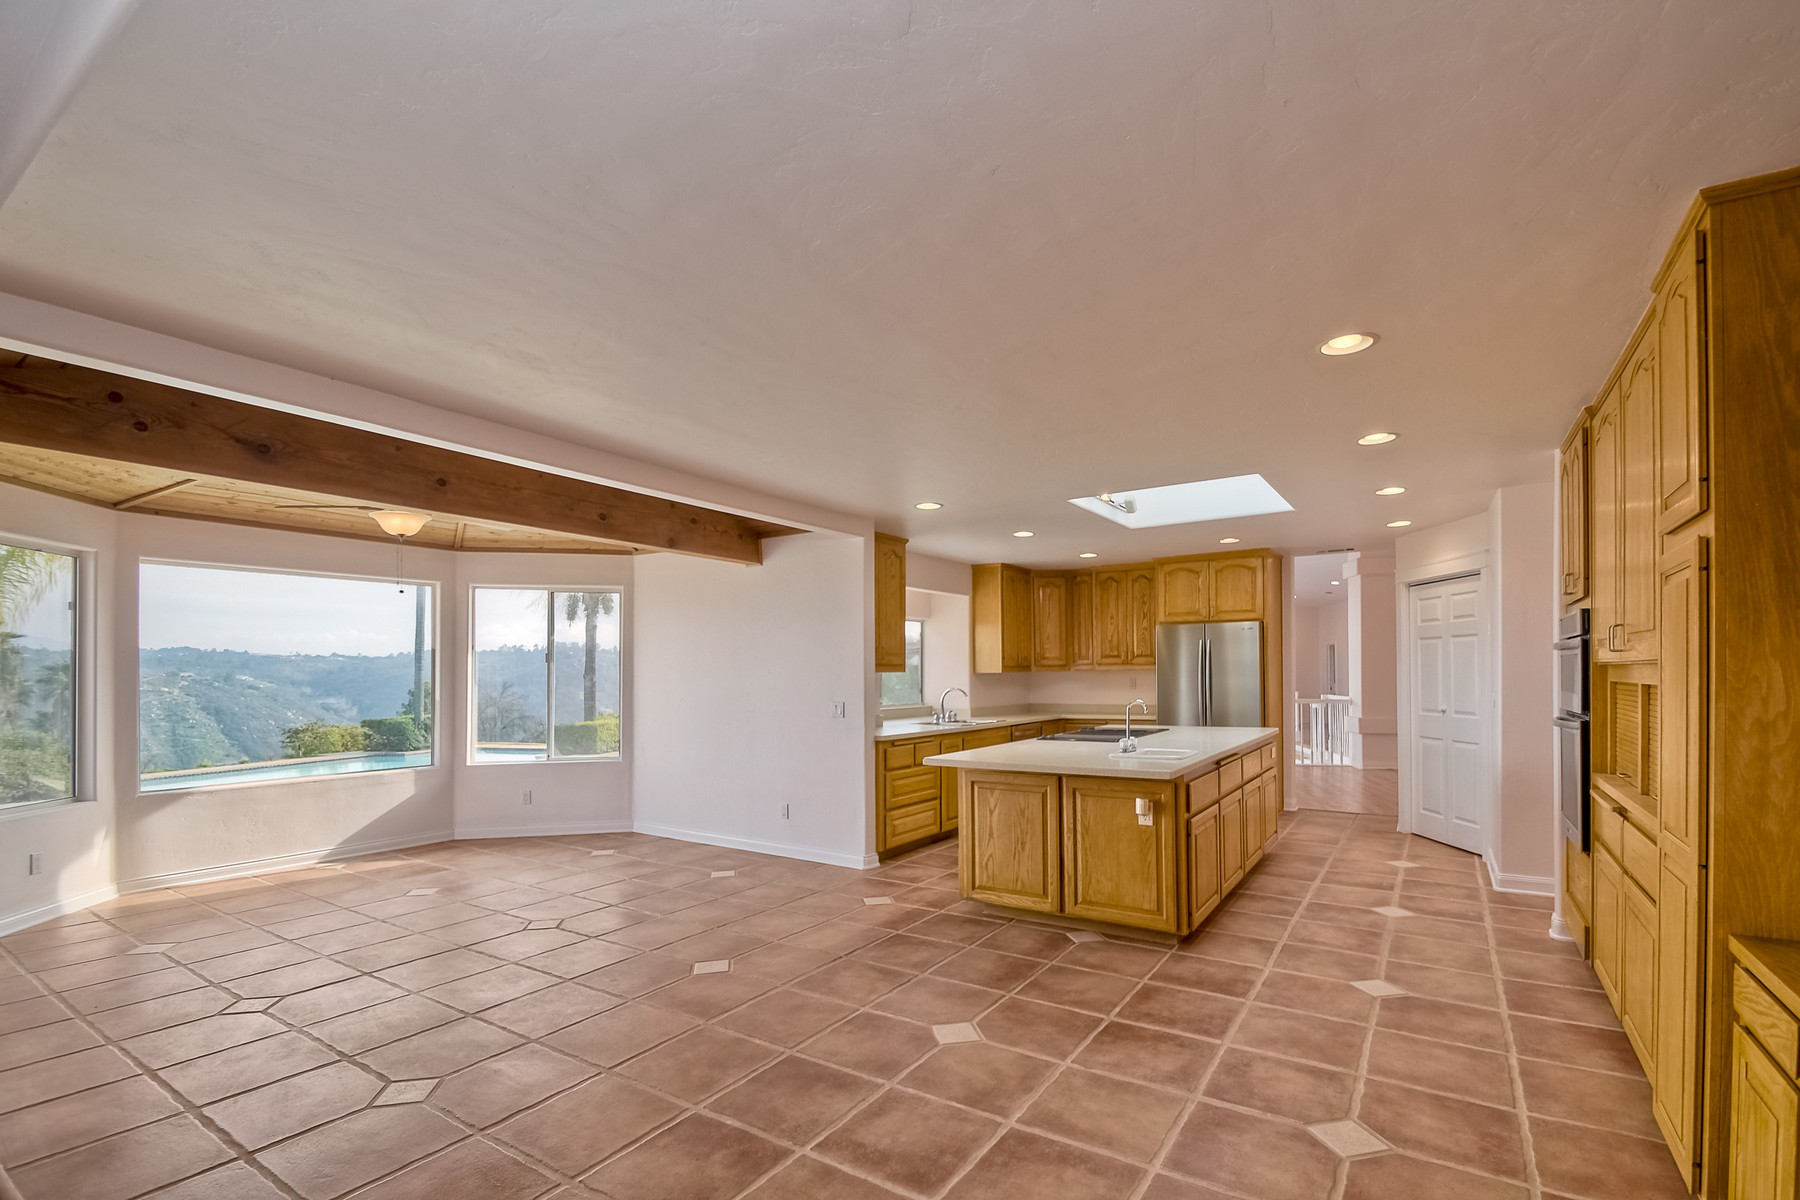 Additional photo for property listing at 36485 Carney Road  Valley Center, California 92082 Estados Unidos